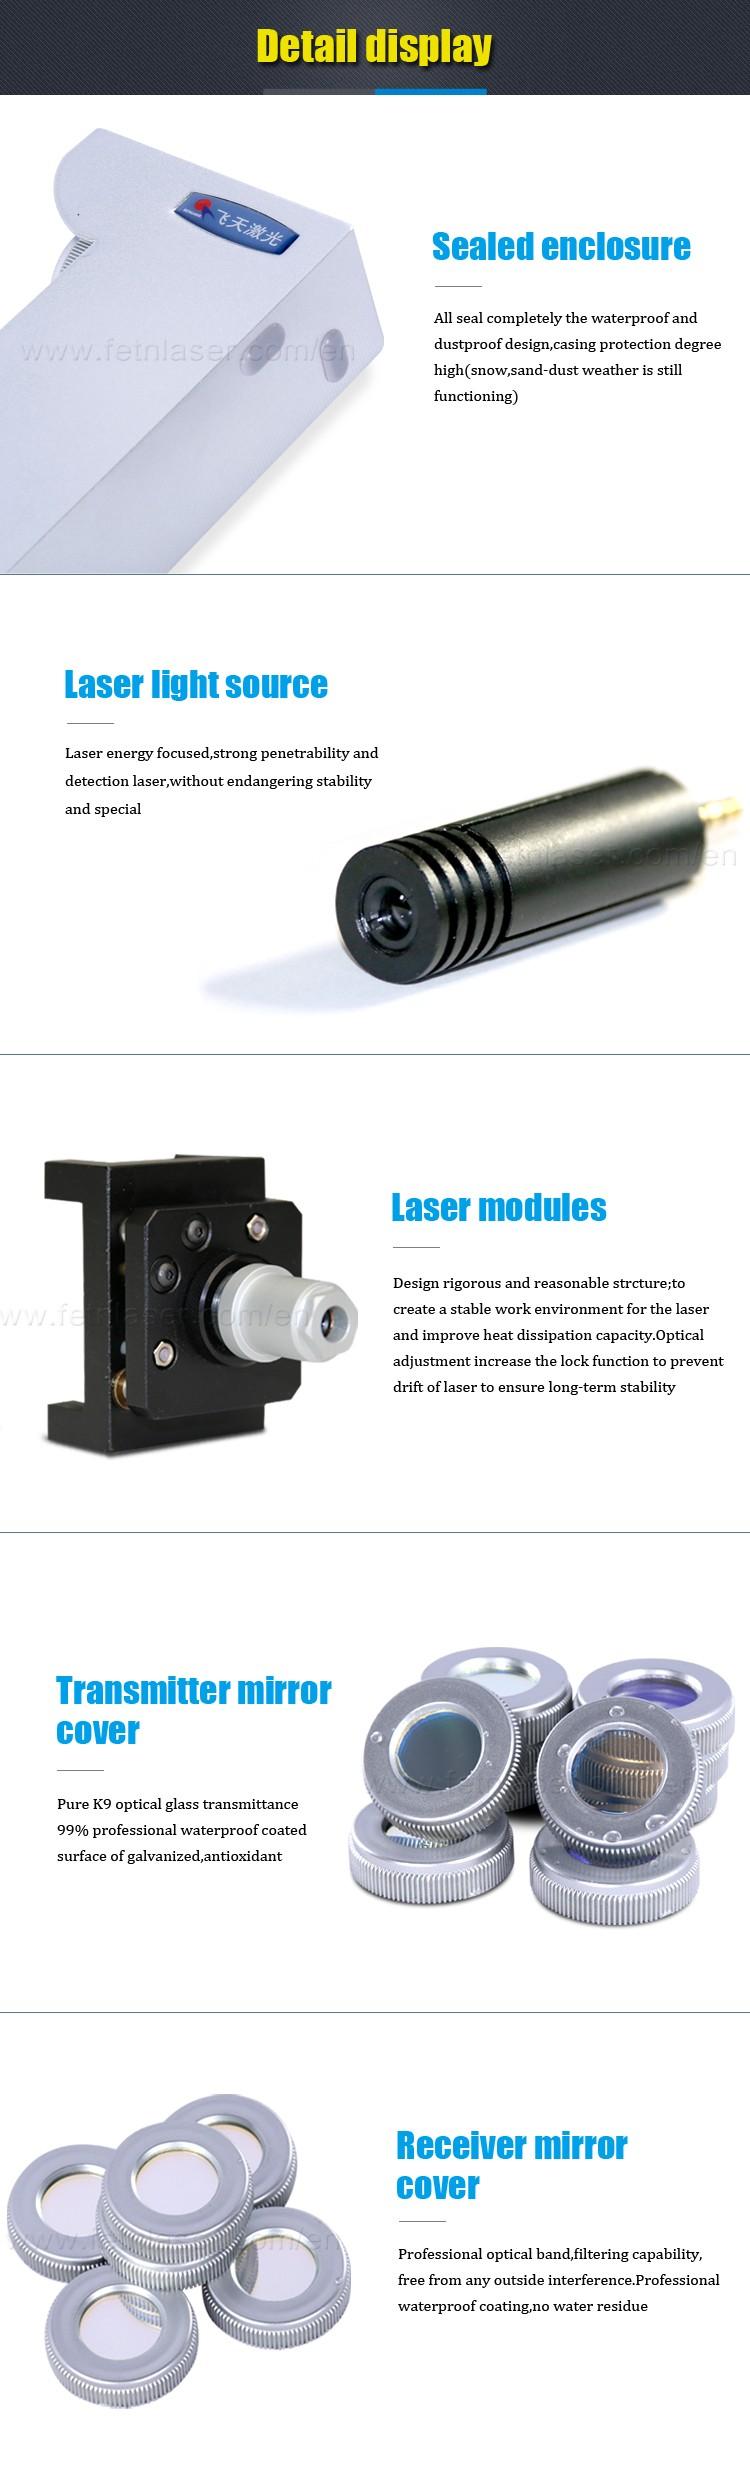 laser beam fence security system.jpg